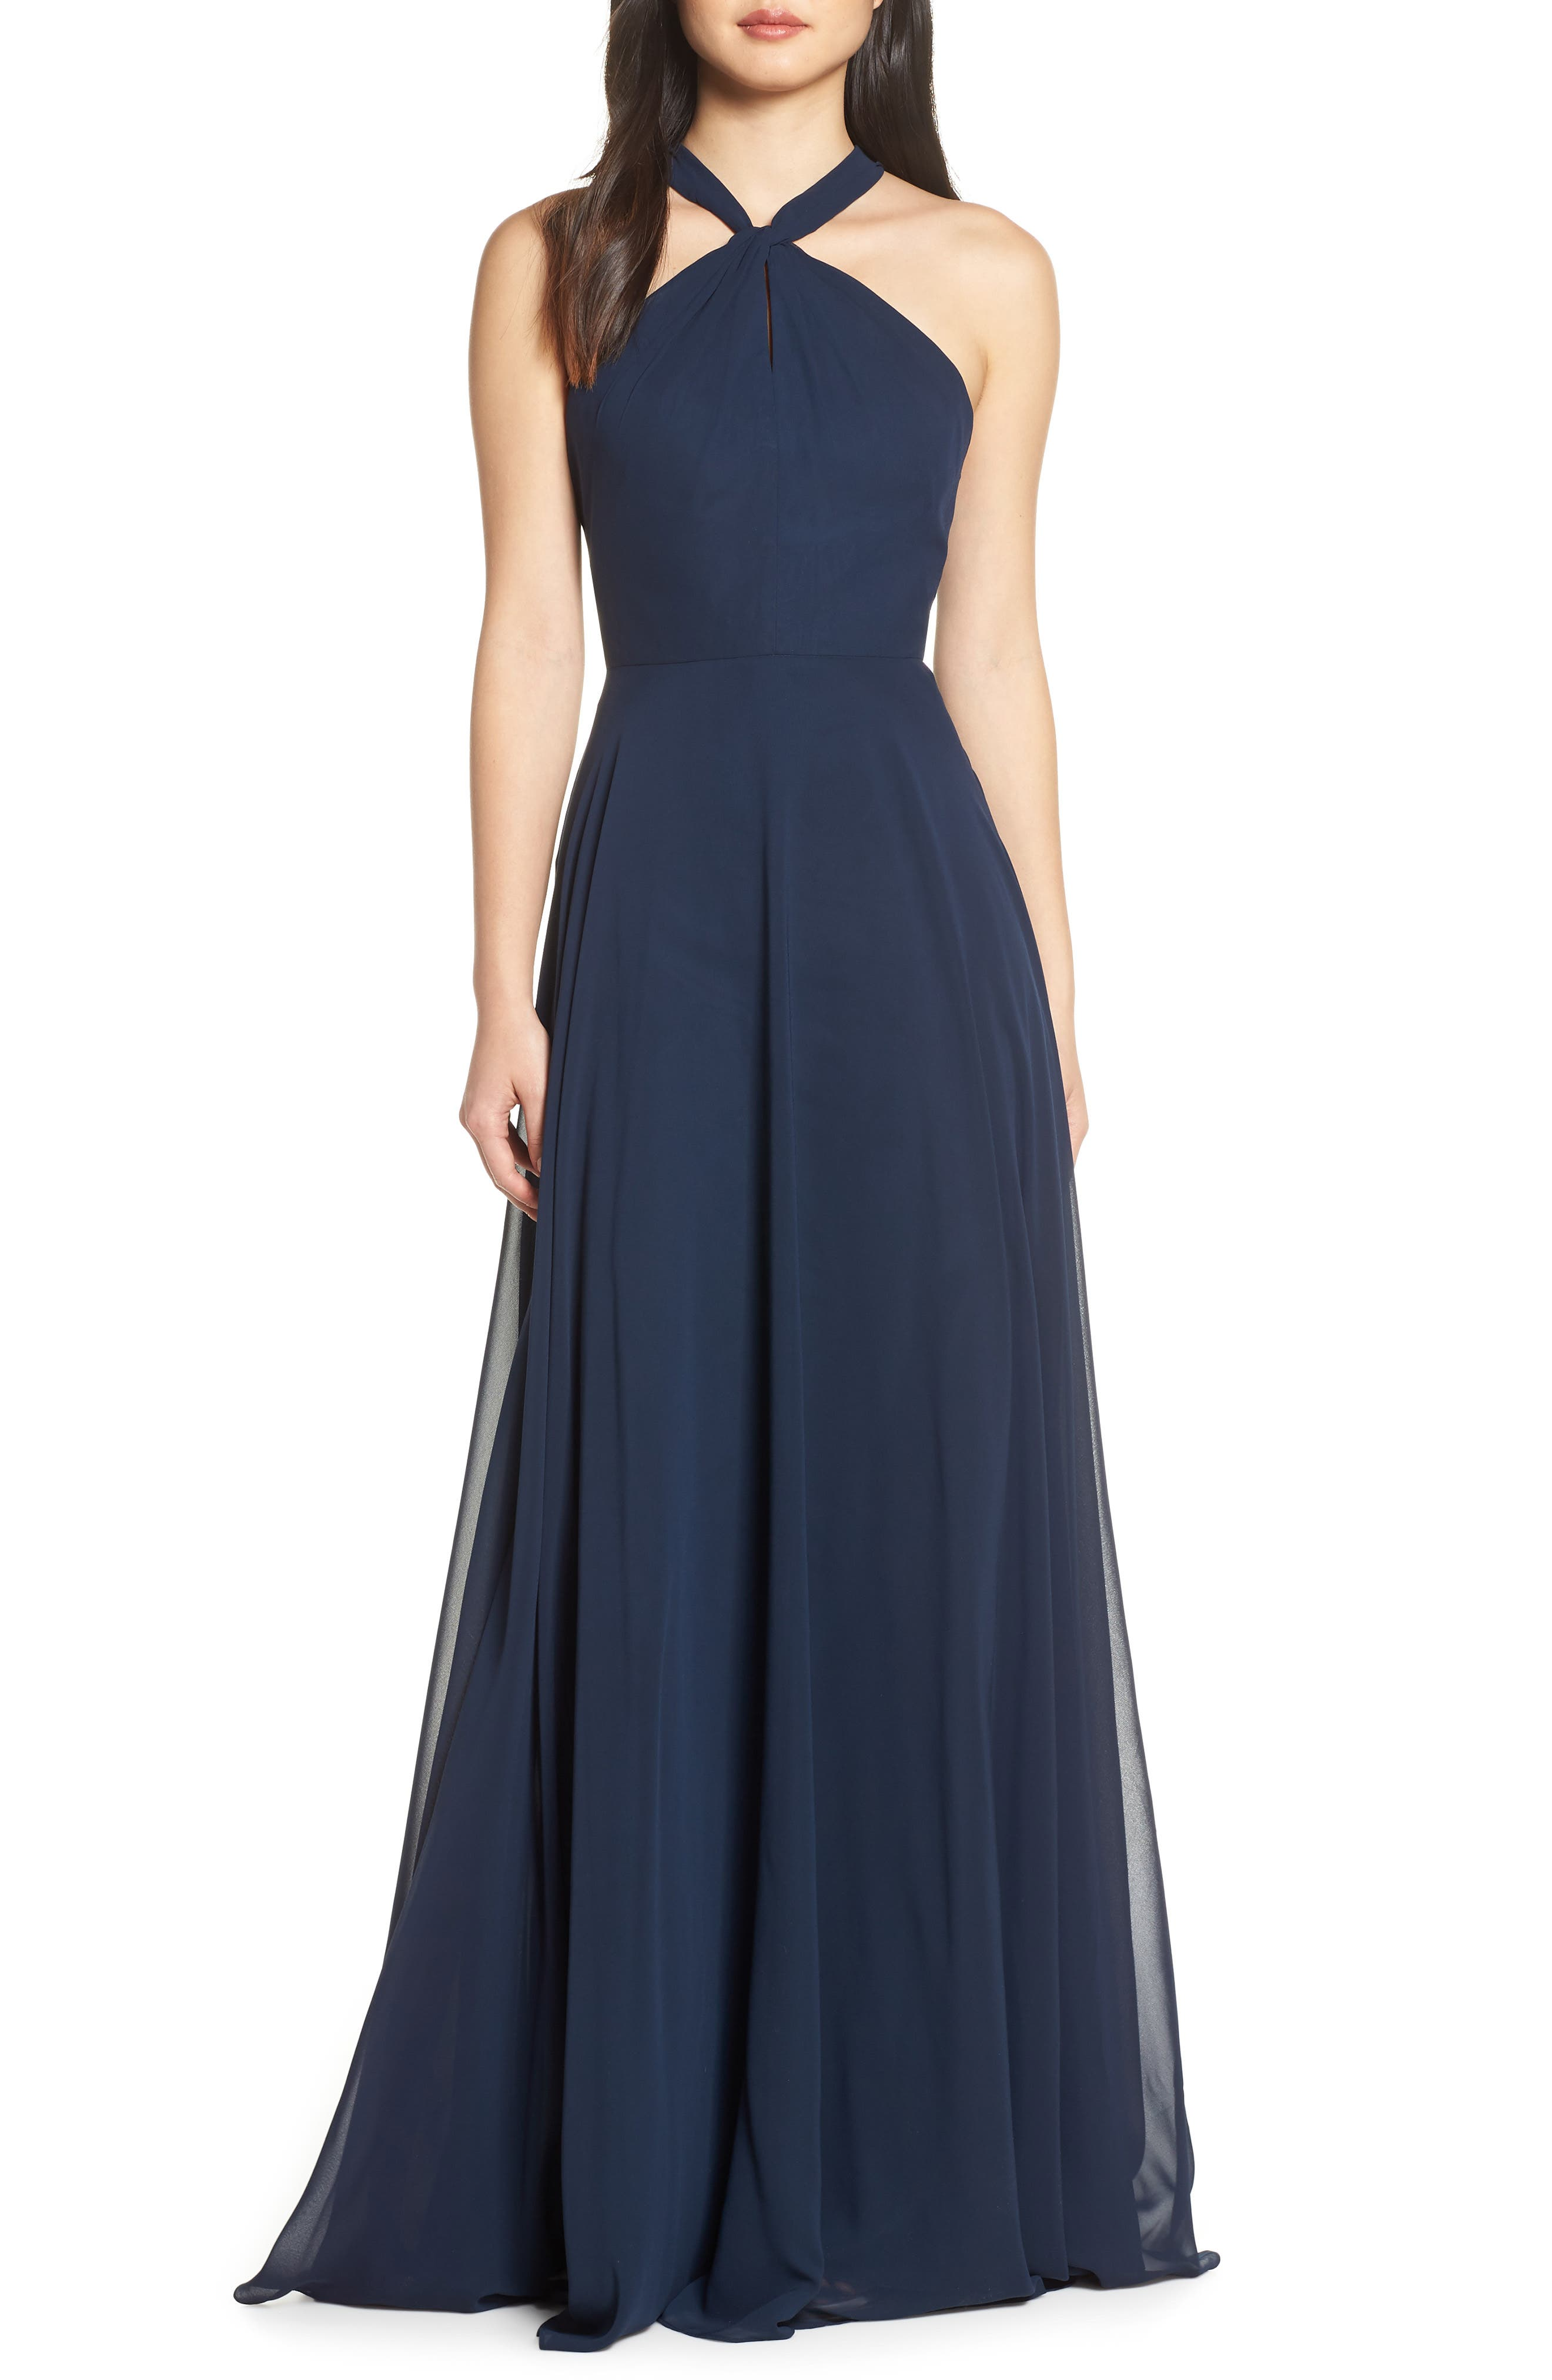 Jenny Yoo Halle Halter Evening Dress, Blue